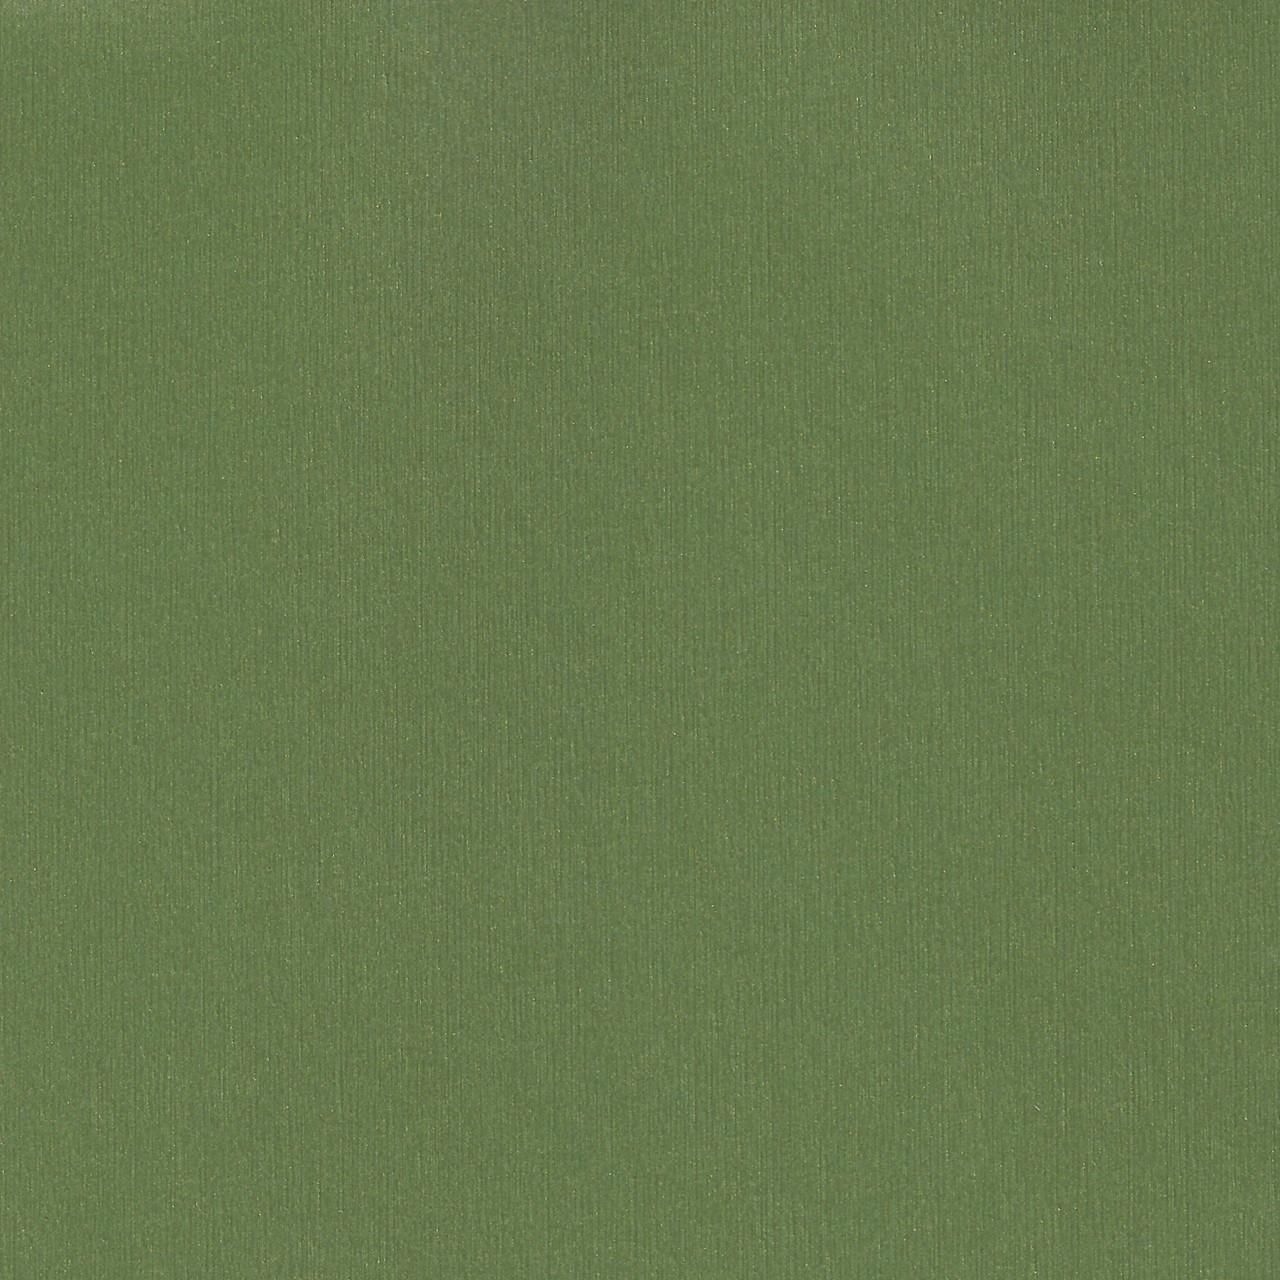 Reflex REF-7816 Lawn